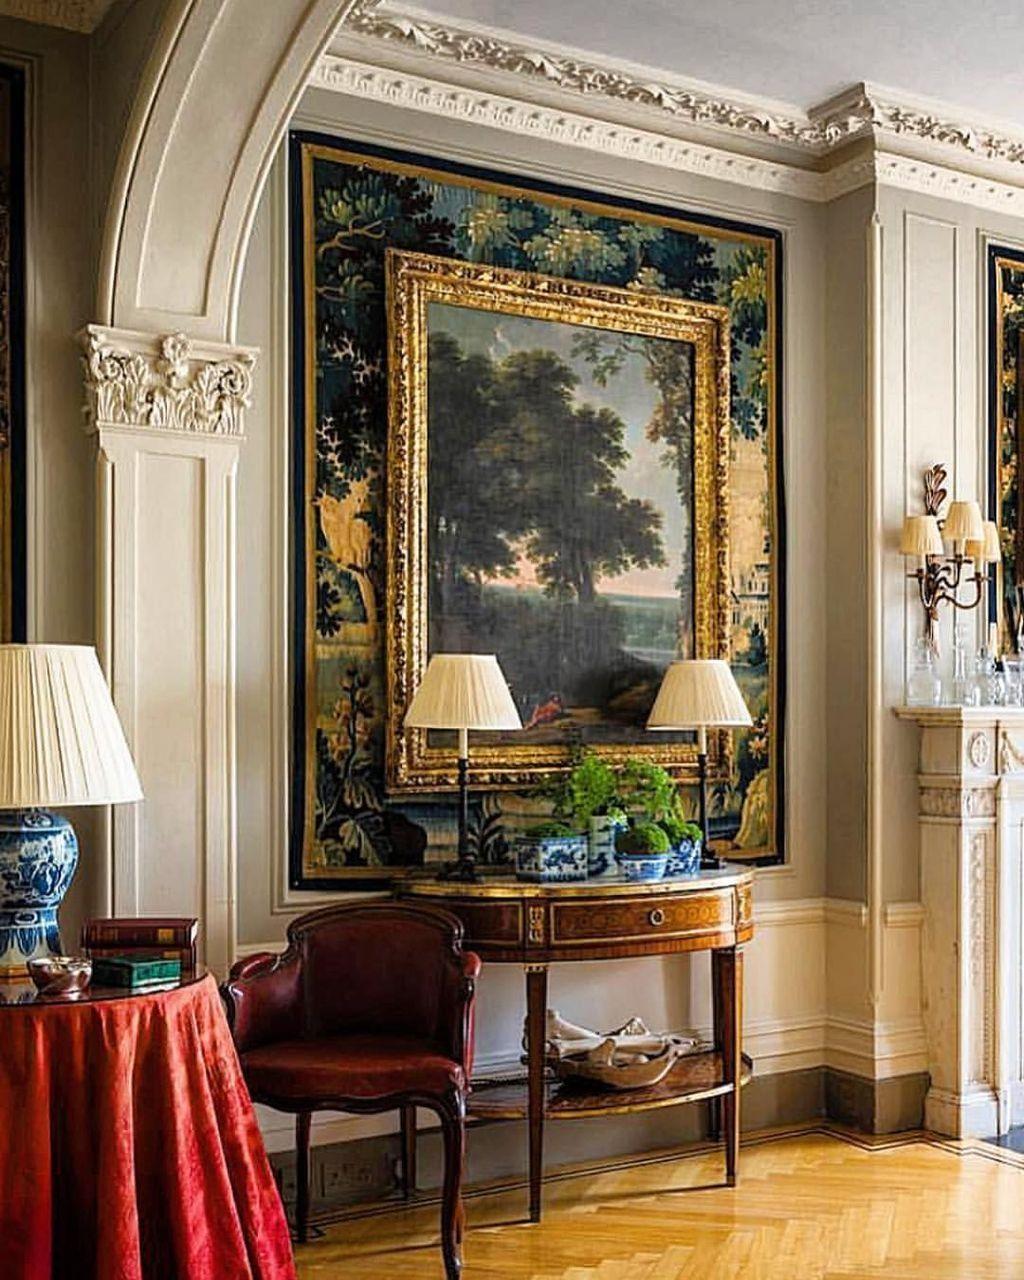 48 Luxury Country Home Decor Ideas   Home Decor ...